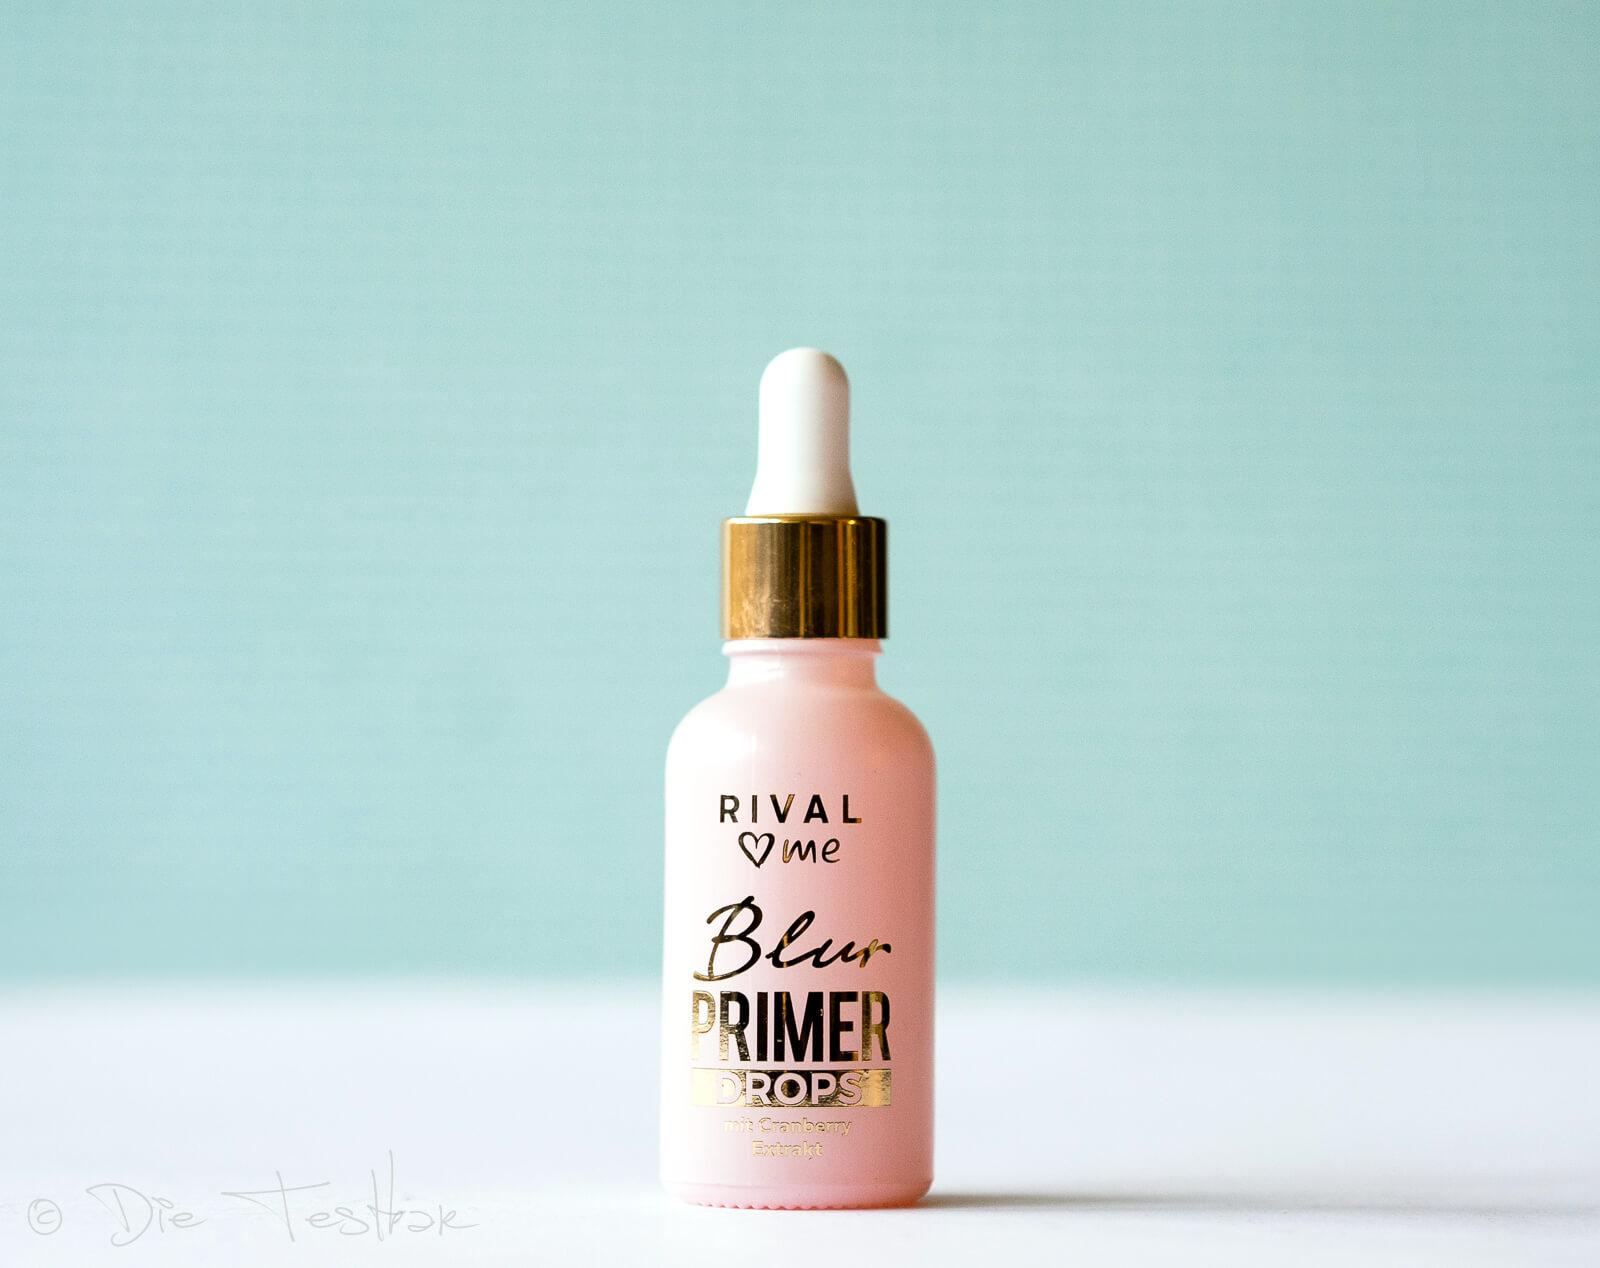 RIVAL loves me - Blur Primer Drops